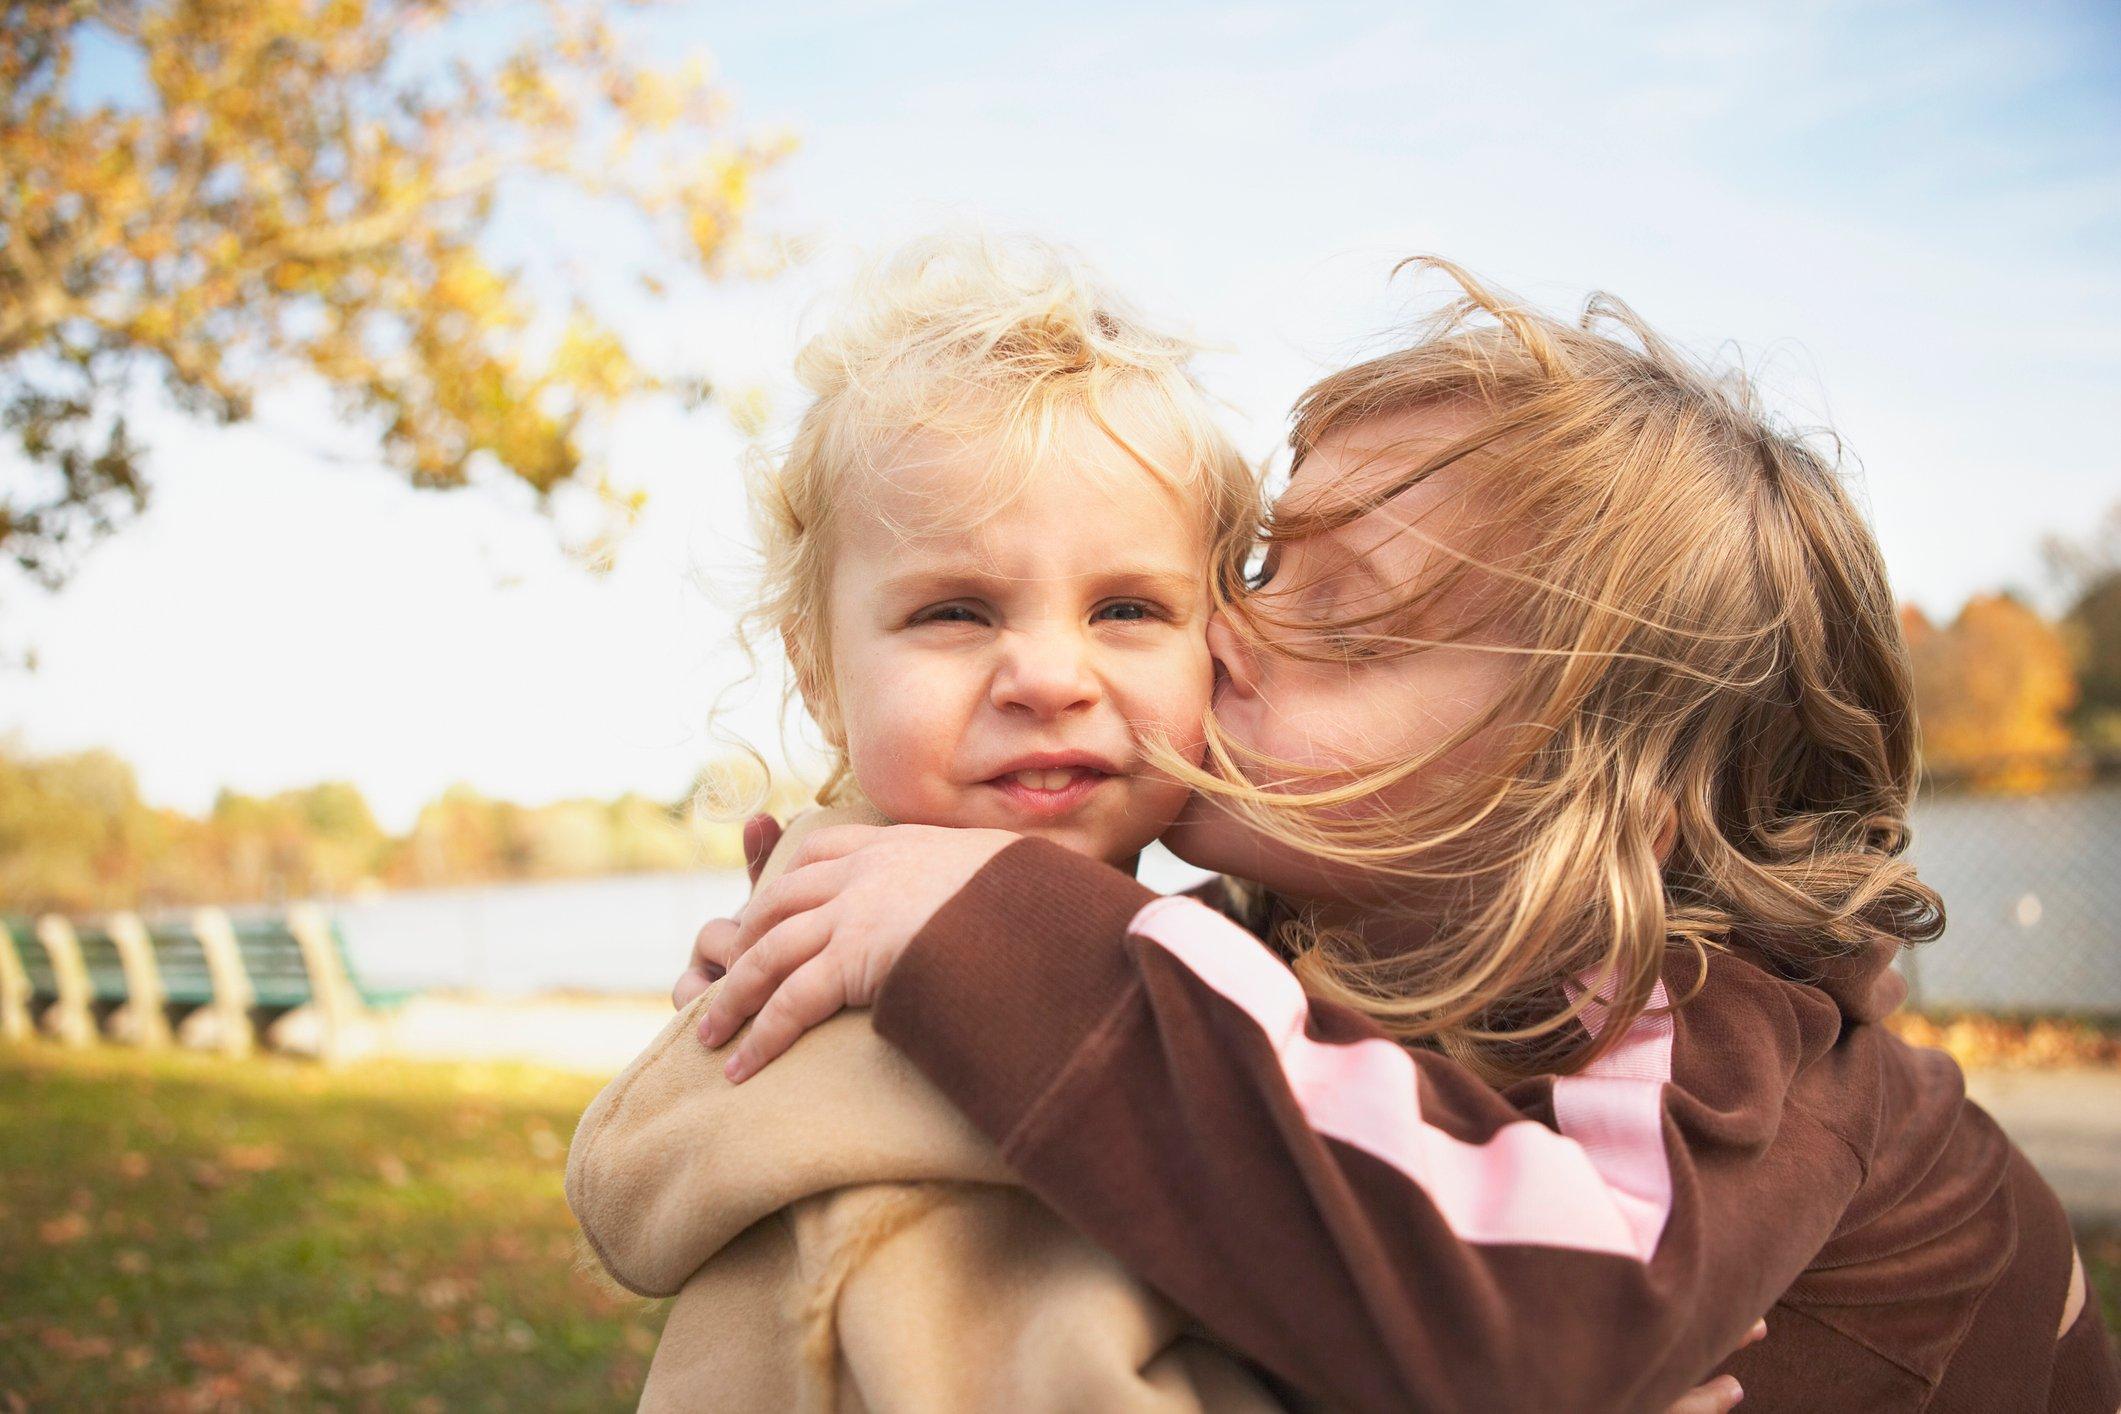 Older Sister Kissing Younger Sister